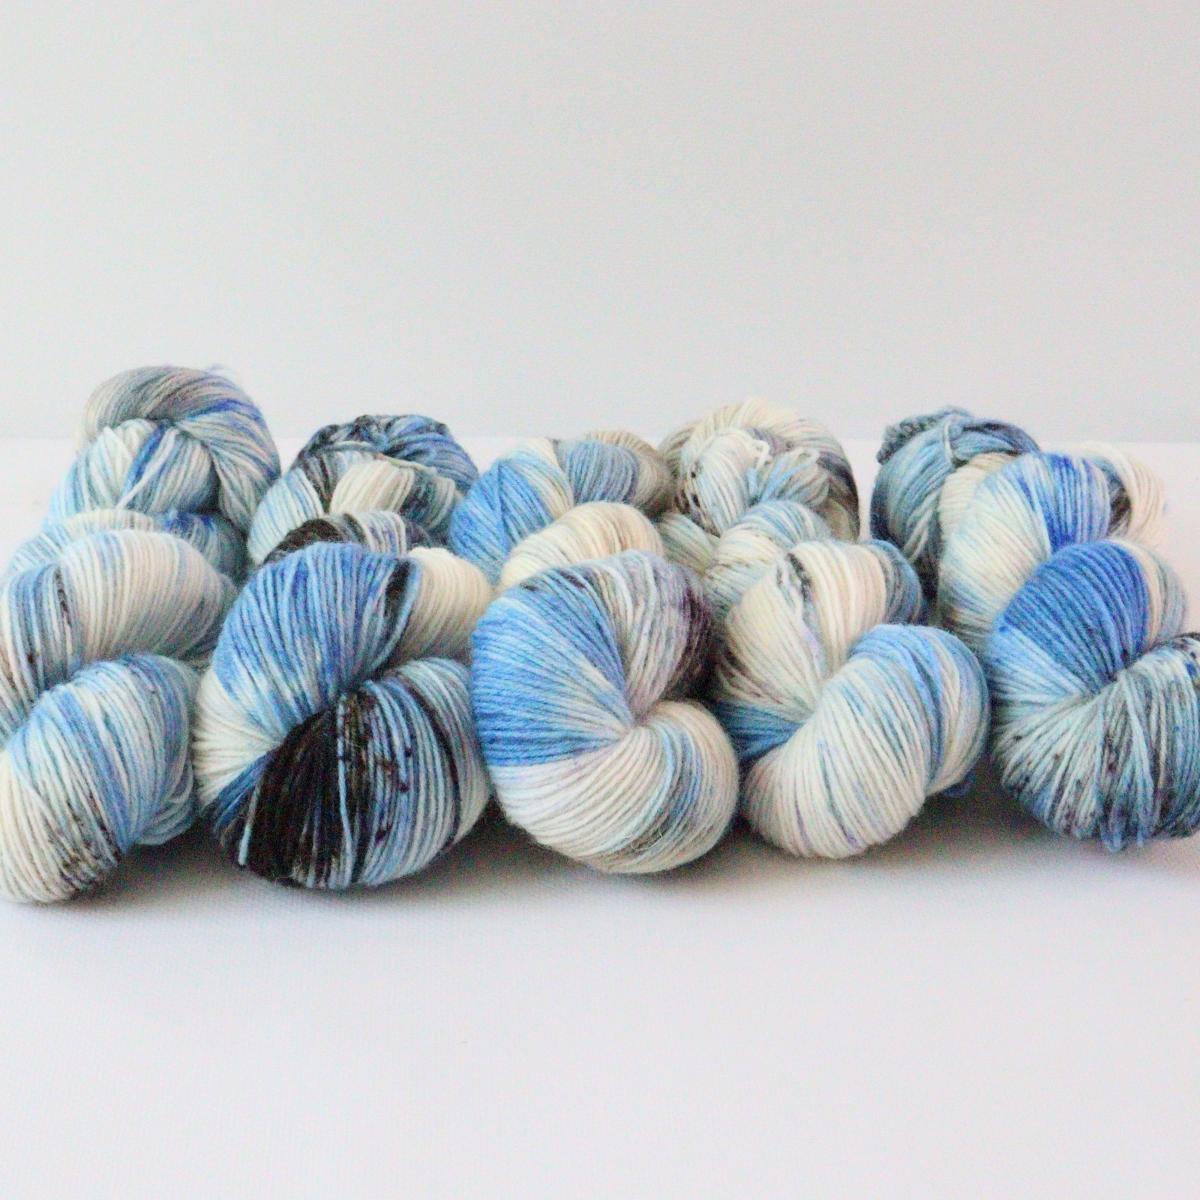 woodico.pro hand dyed yarn 081 3 1200x1200 - Hand dyed yarn / 081